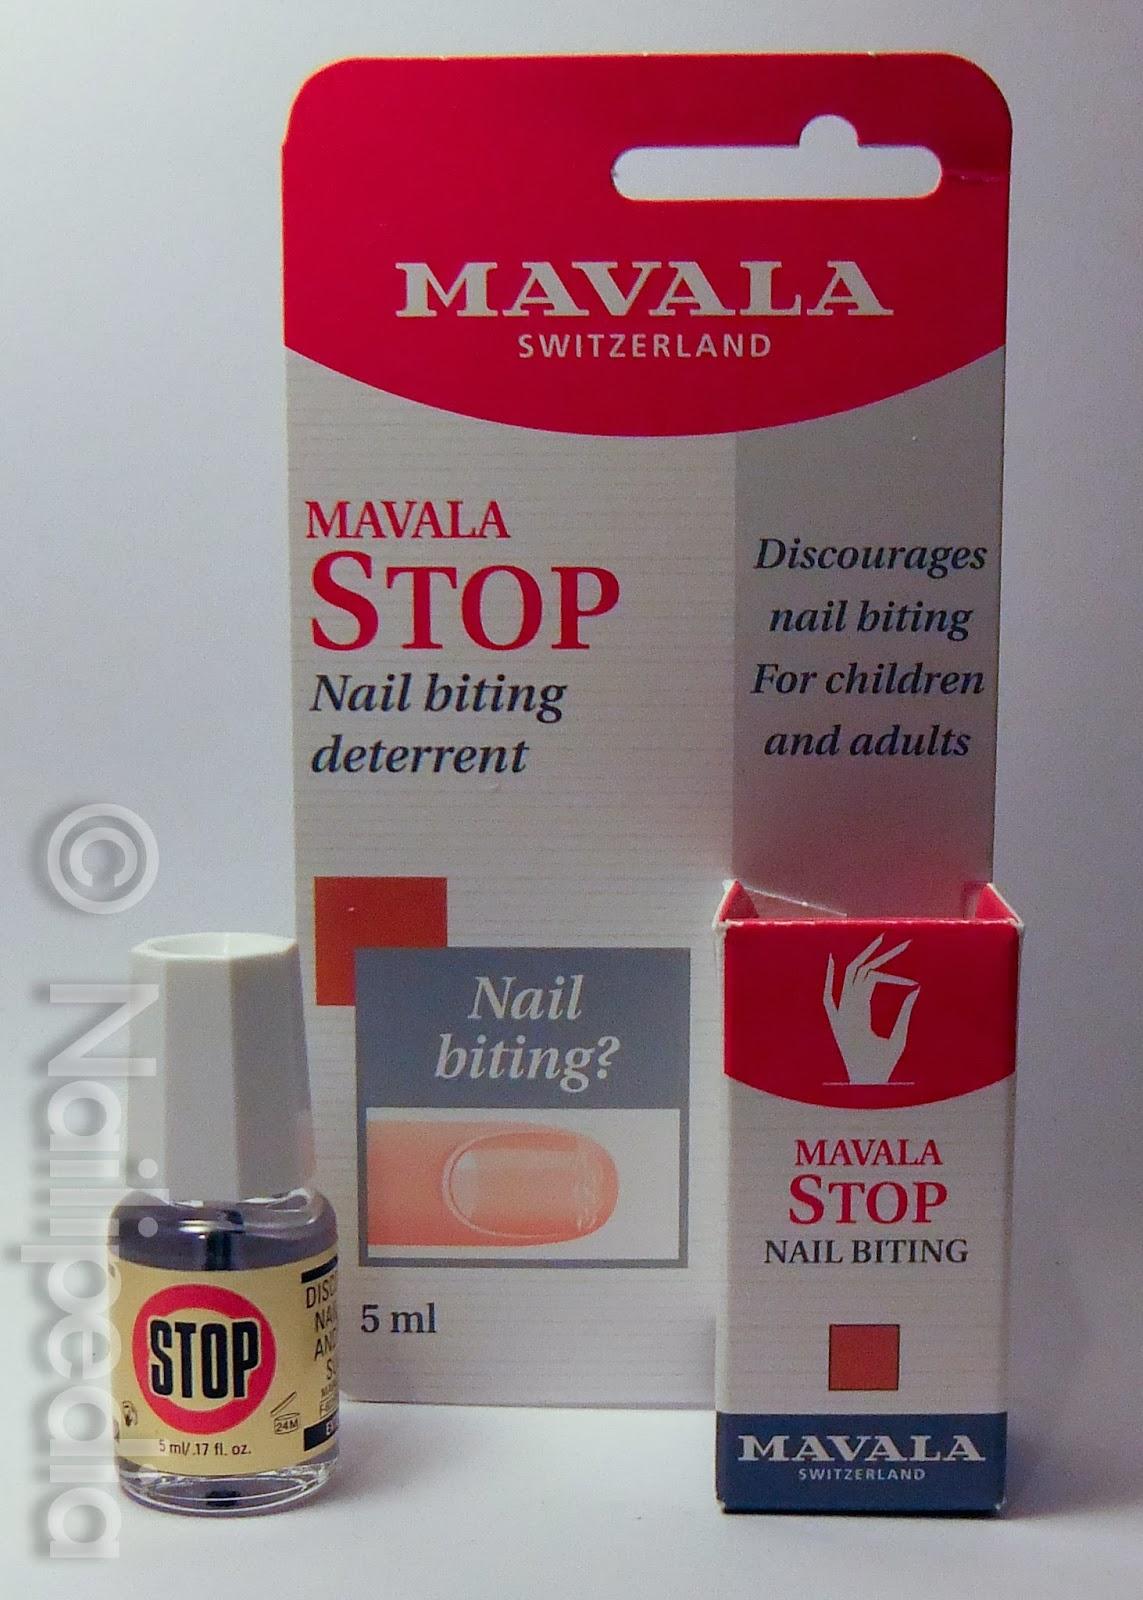 Mavala stop review - Restaurant in kirkland wa